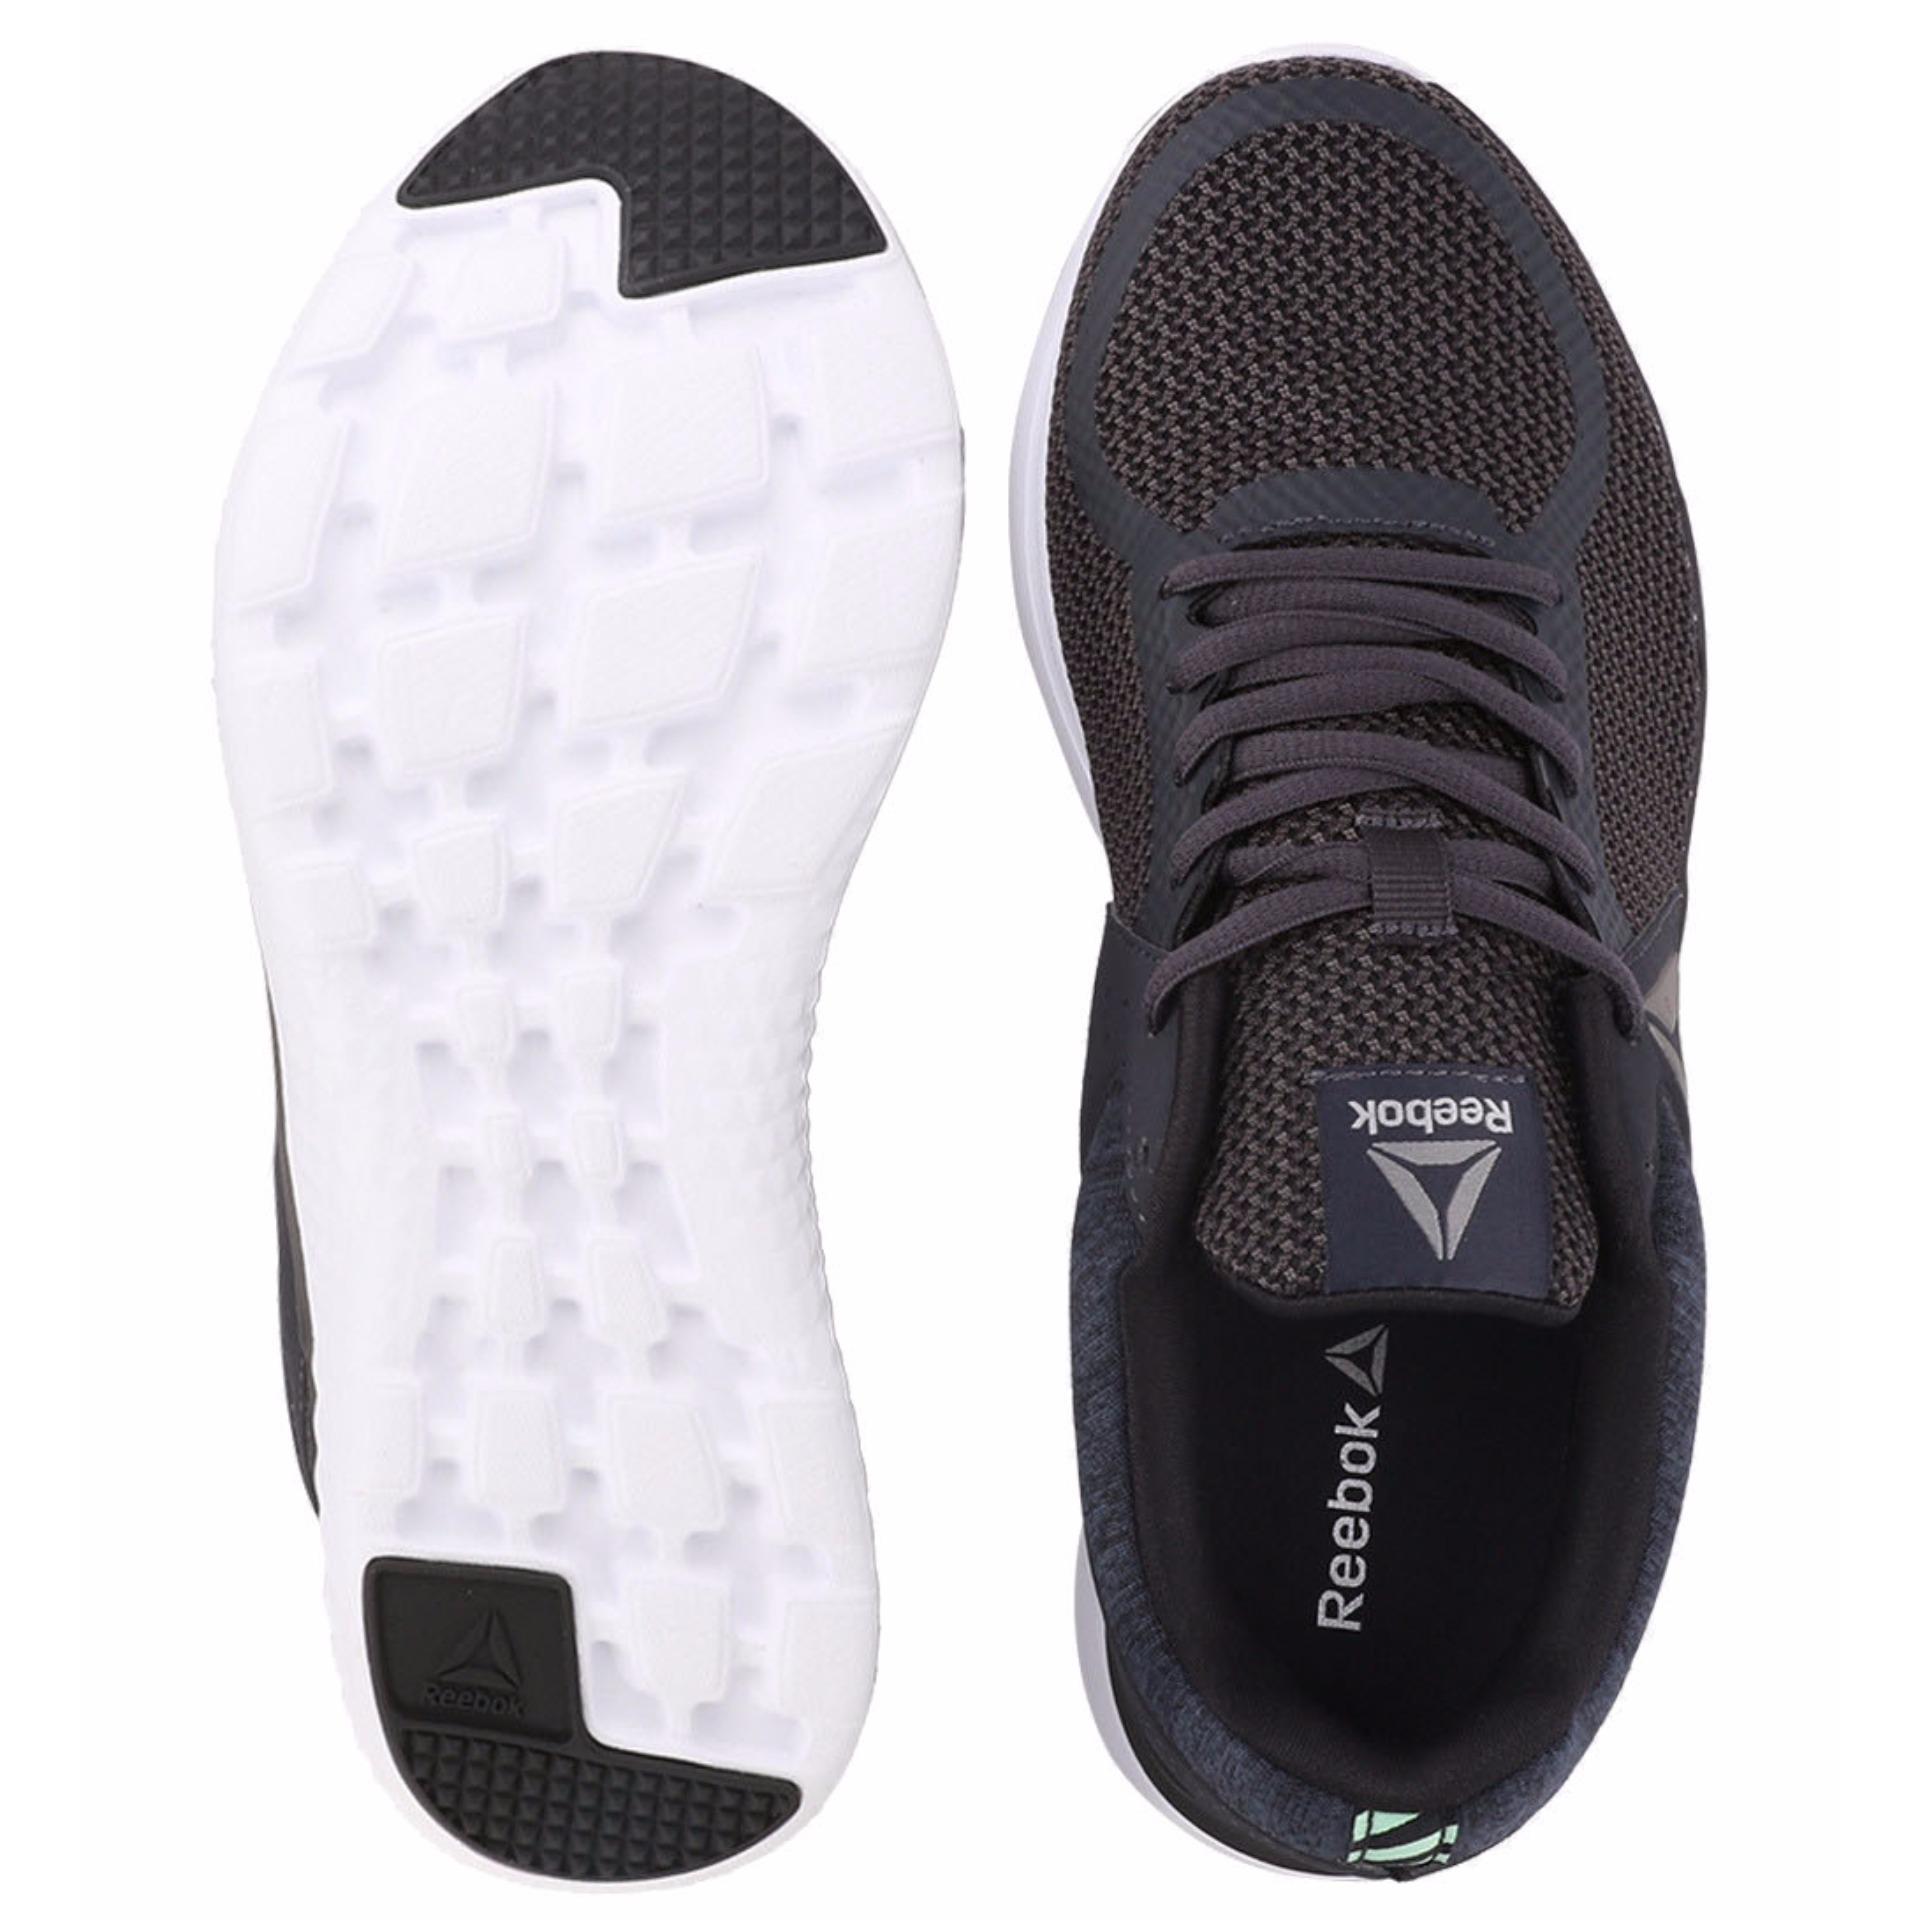 Reebok Mens Casual Shoes Sublite Super Duo Walking Shoes Men Reebok ... 2727e258eb